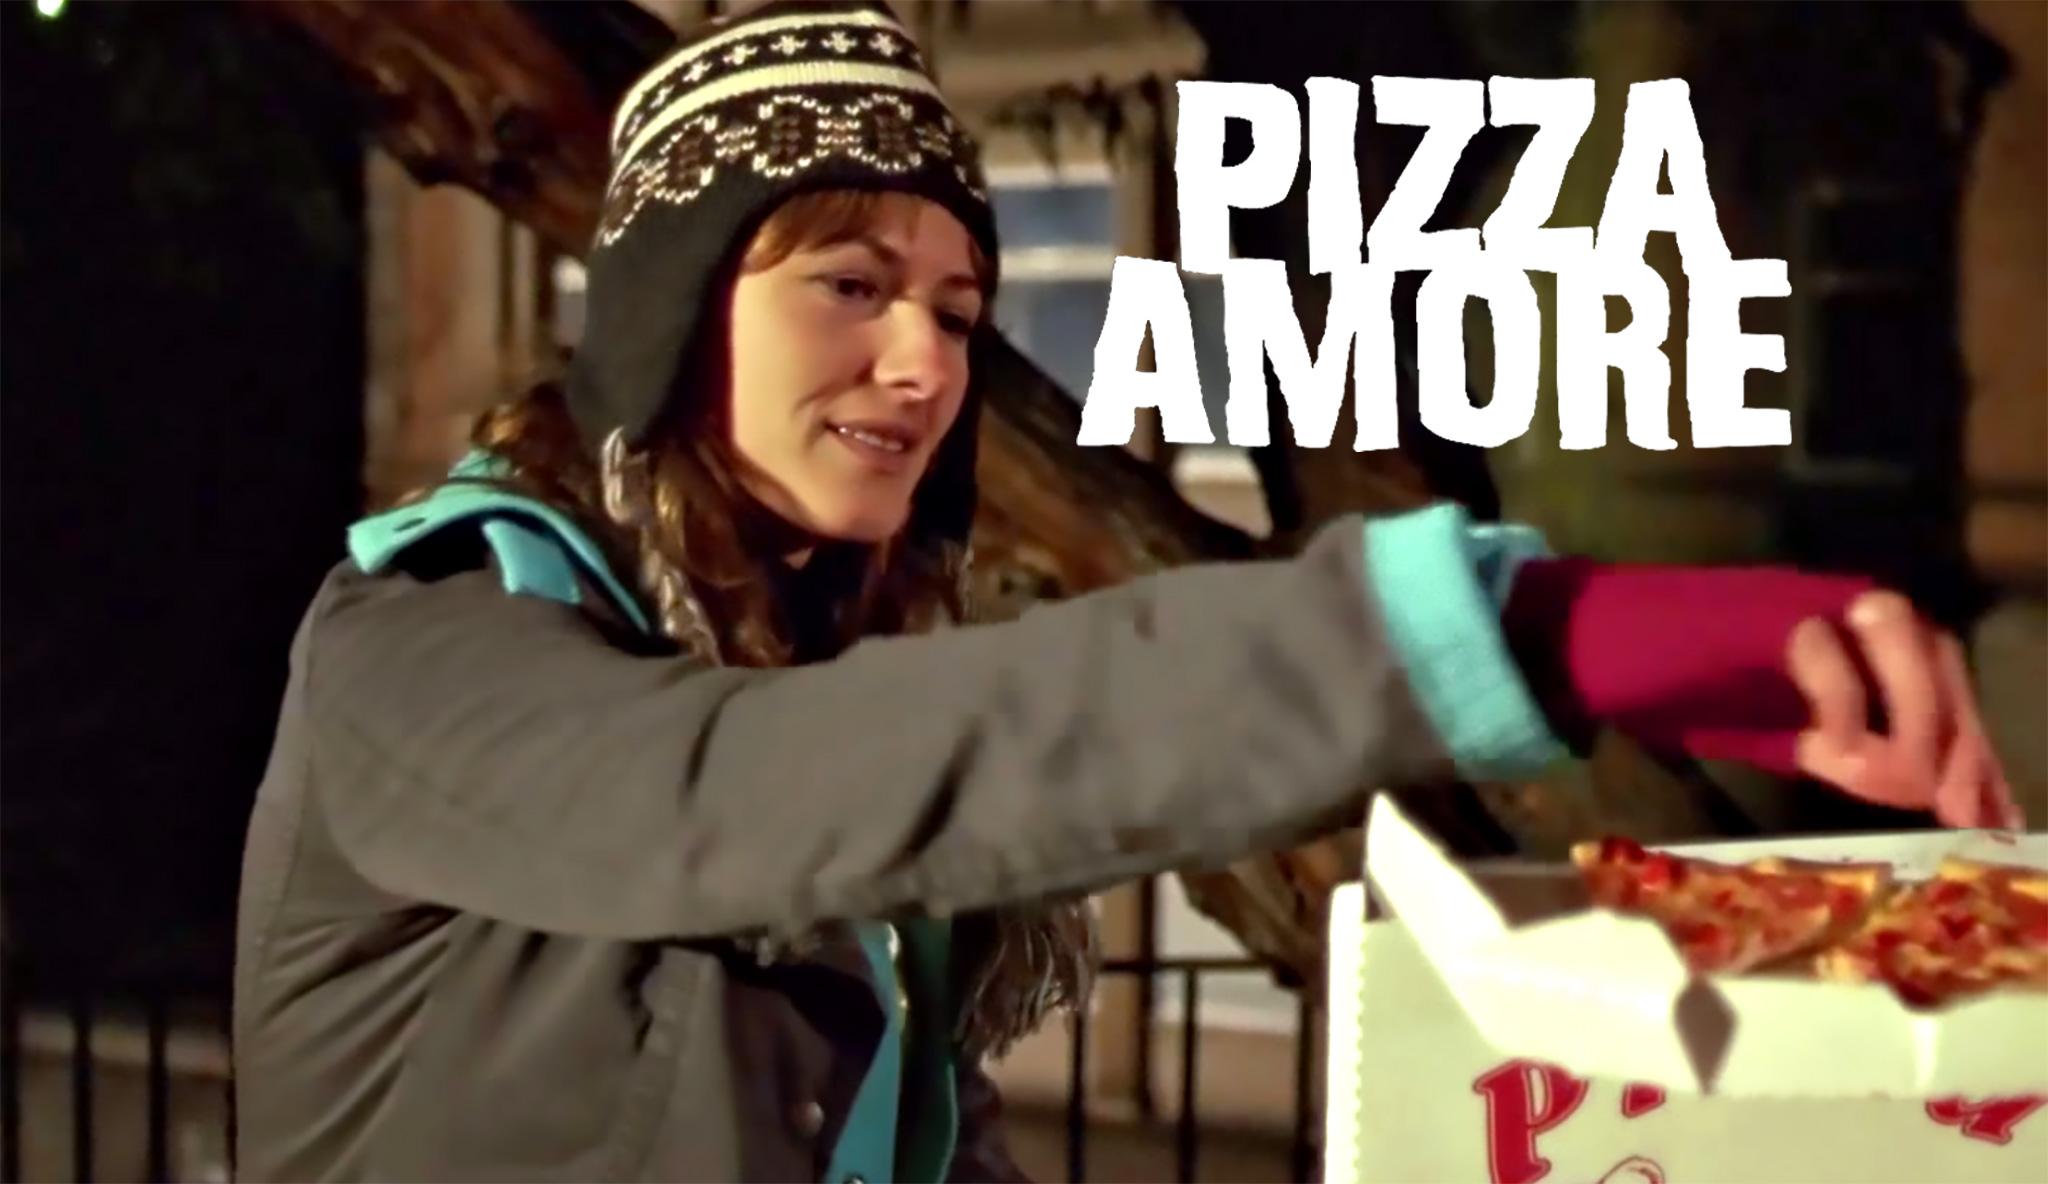 pizza-amore\header.jpg